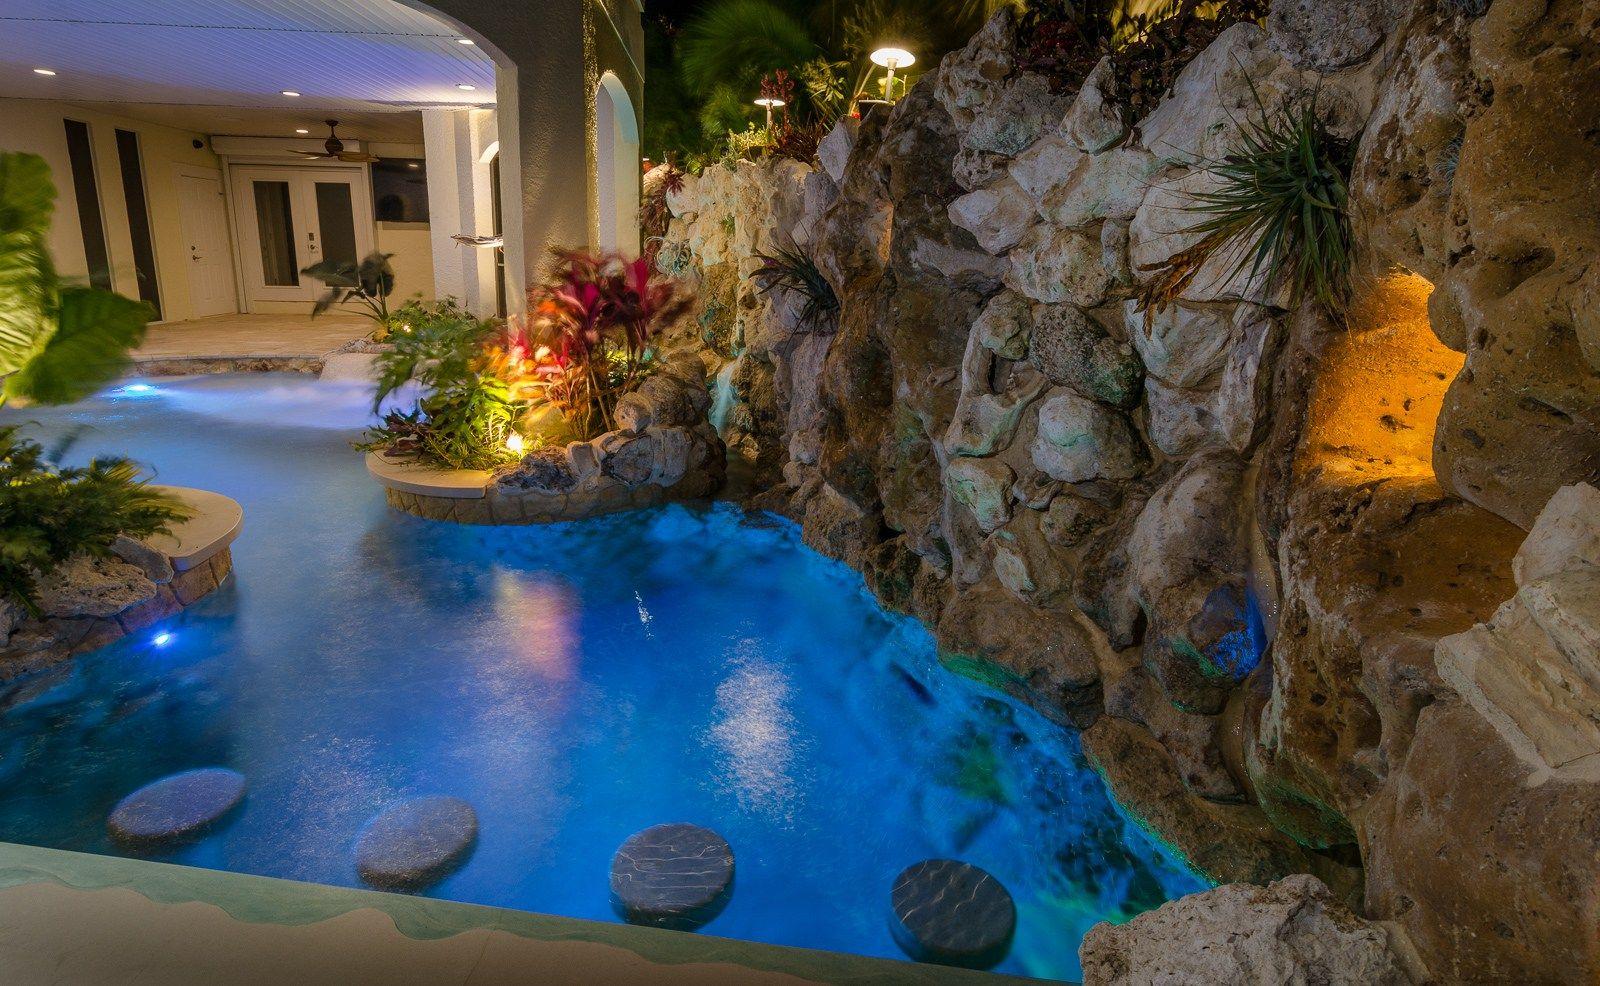 Living Under The Sea Lucas Lagoons Insane Pools Pool Houses Pool